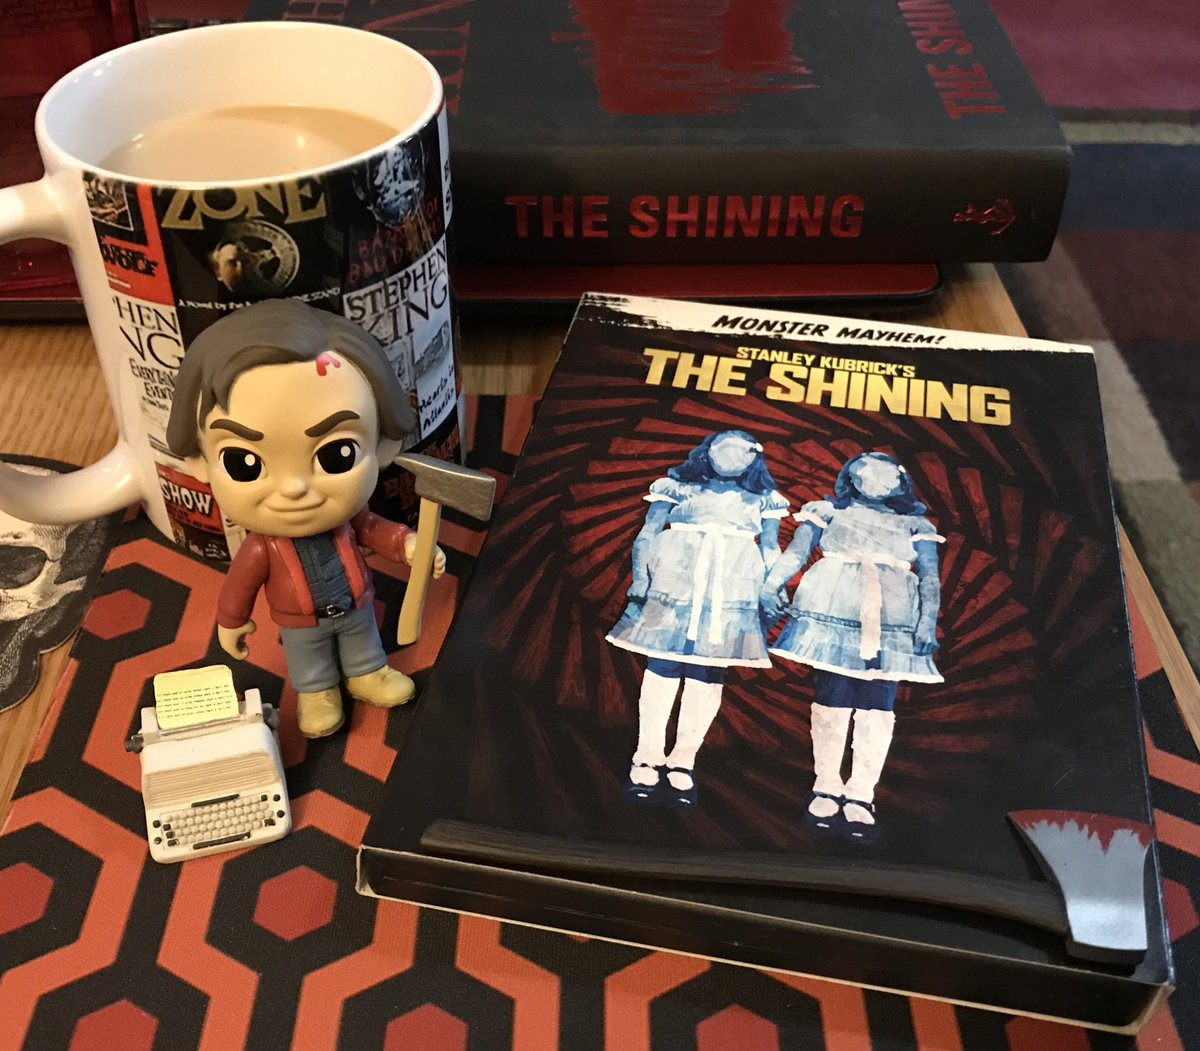 Watching The Shining tonight#MovieTime #TheShining40 <br>http://pic.twitter.com/7LH45RGoQQ